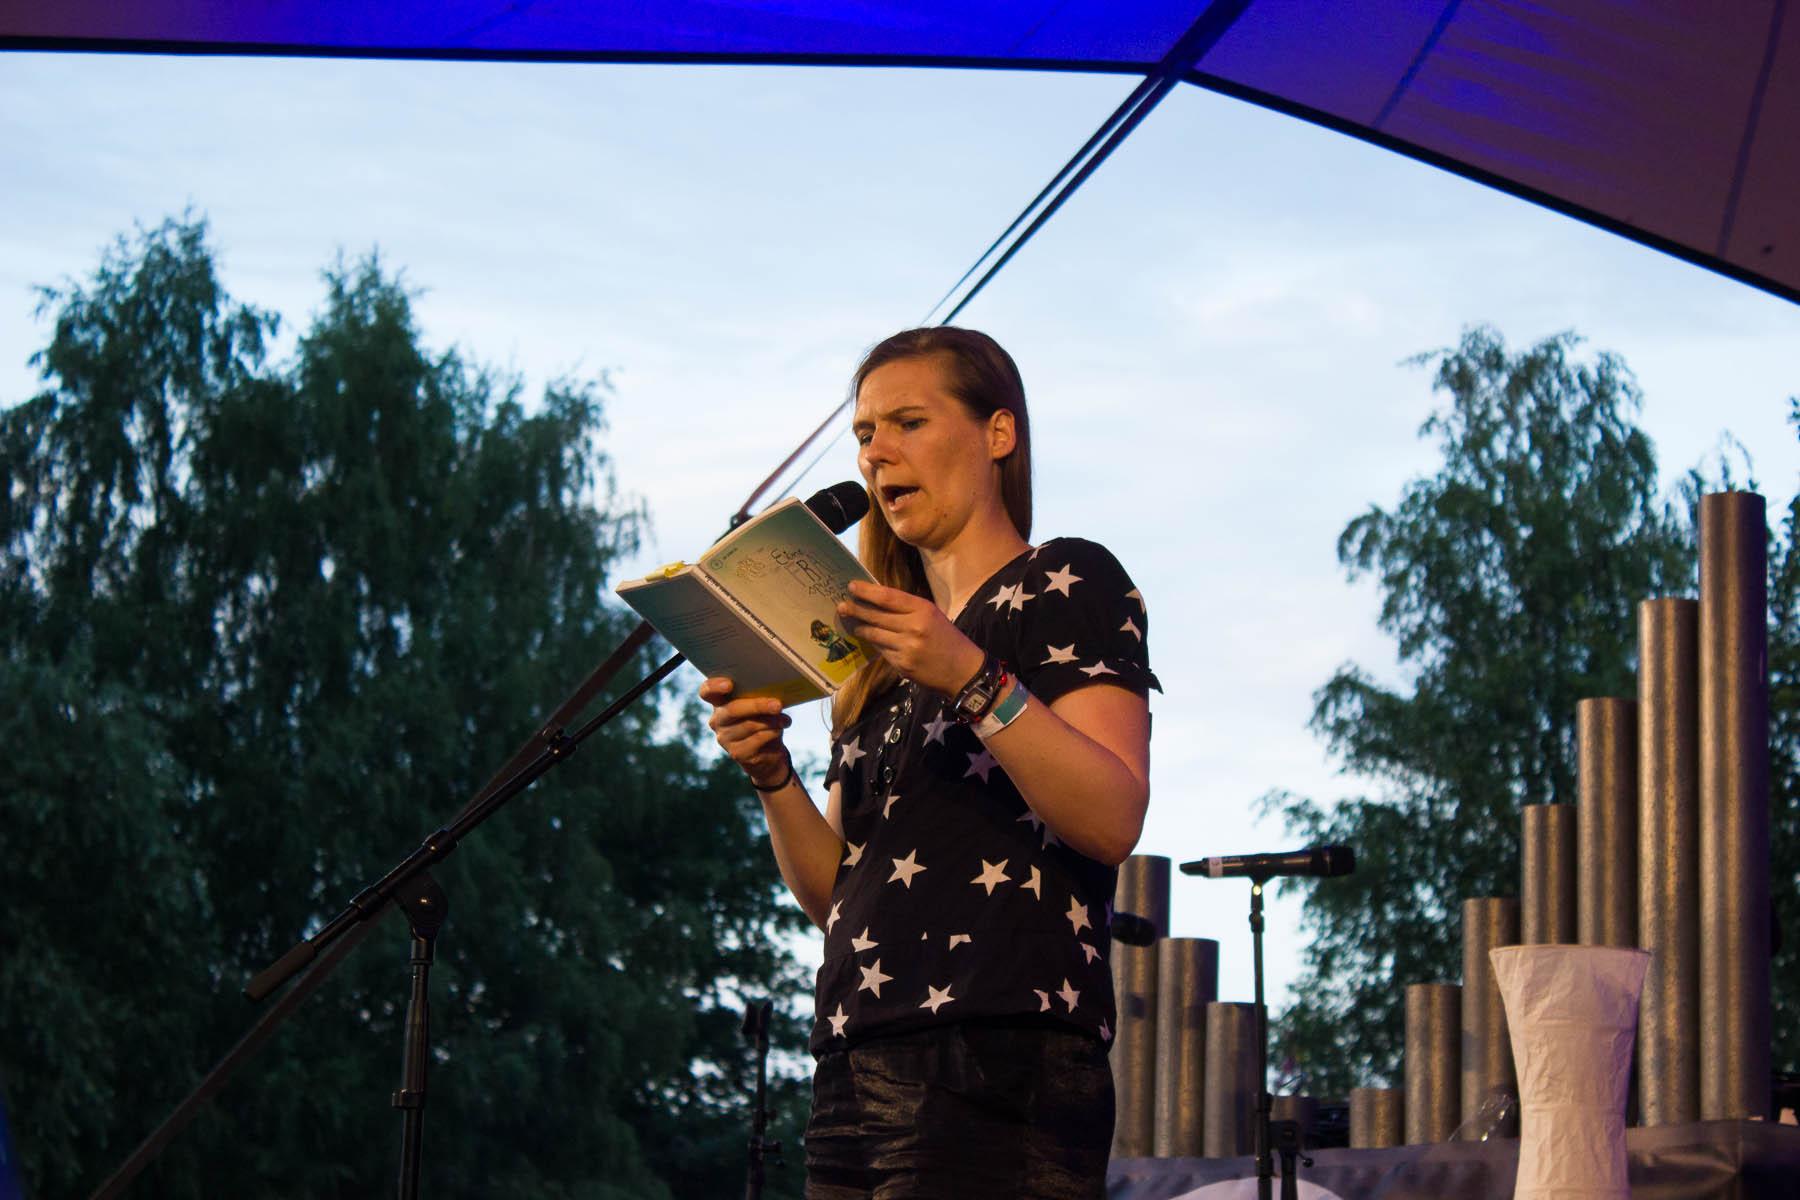 Axel Füllgraf - Slamville 2016 - Kirsten Fuchs